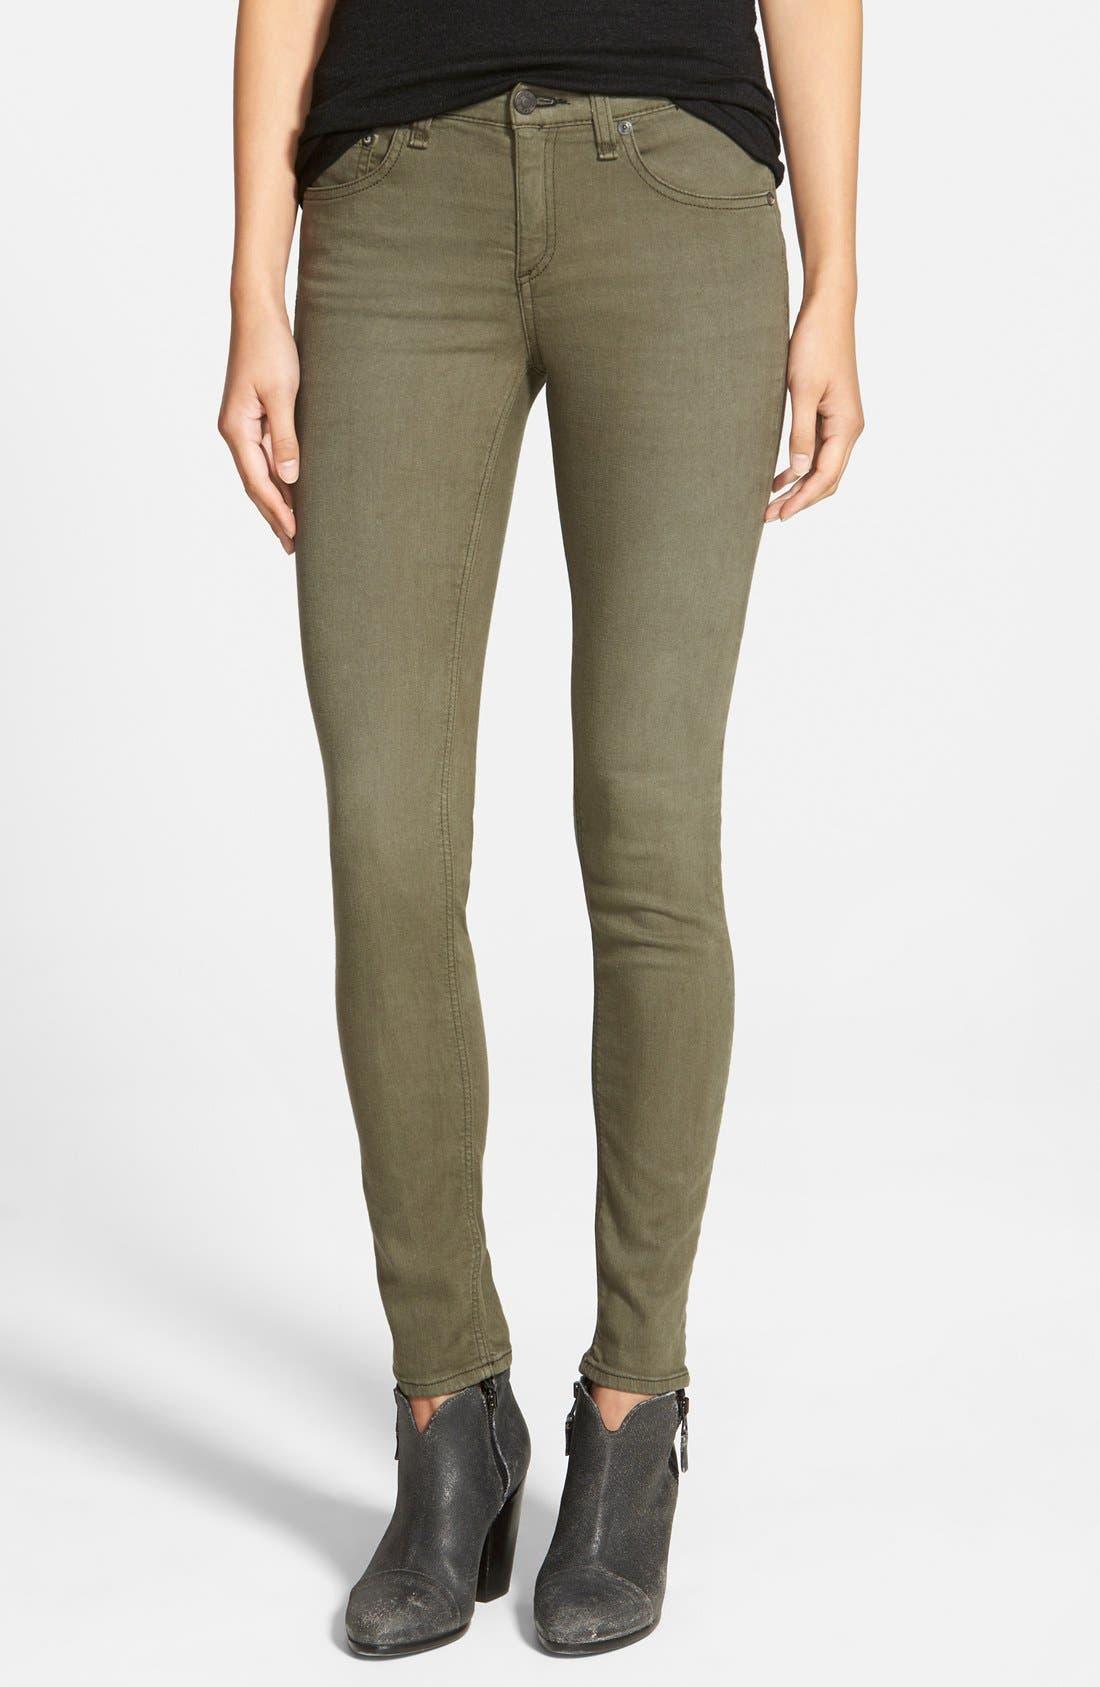 Alternate Image 1 Selected - rag & bone/JEAN 'The Skinny' Jeans (Distressed Fatigue) (Nordstrom Exclusive)